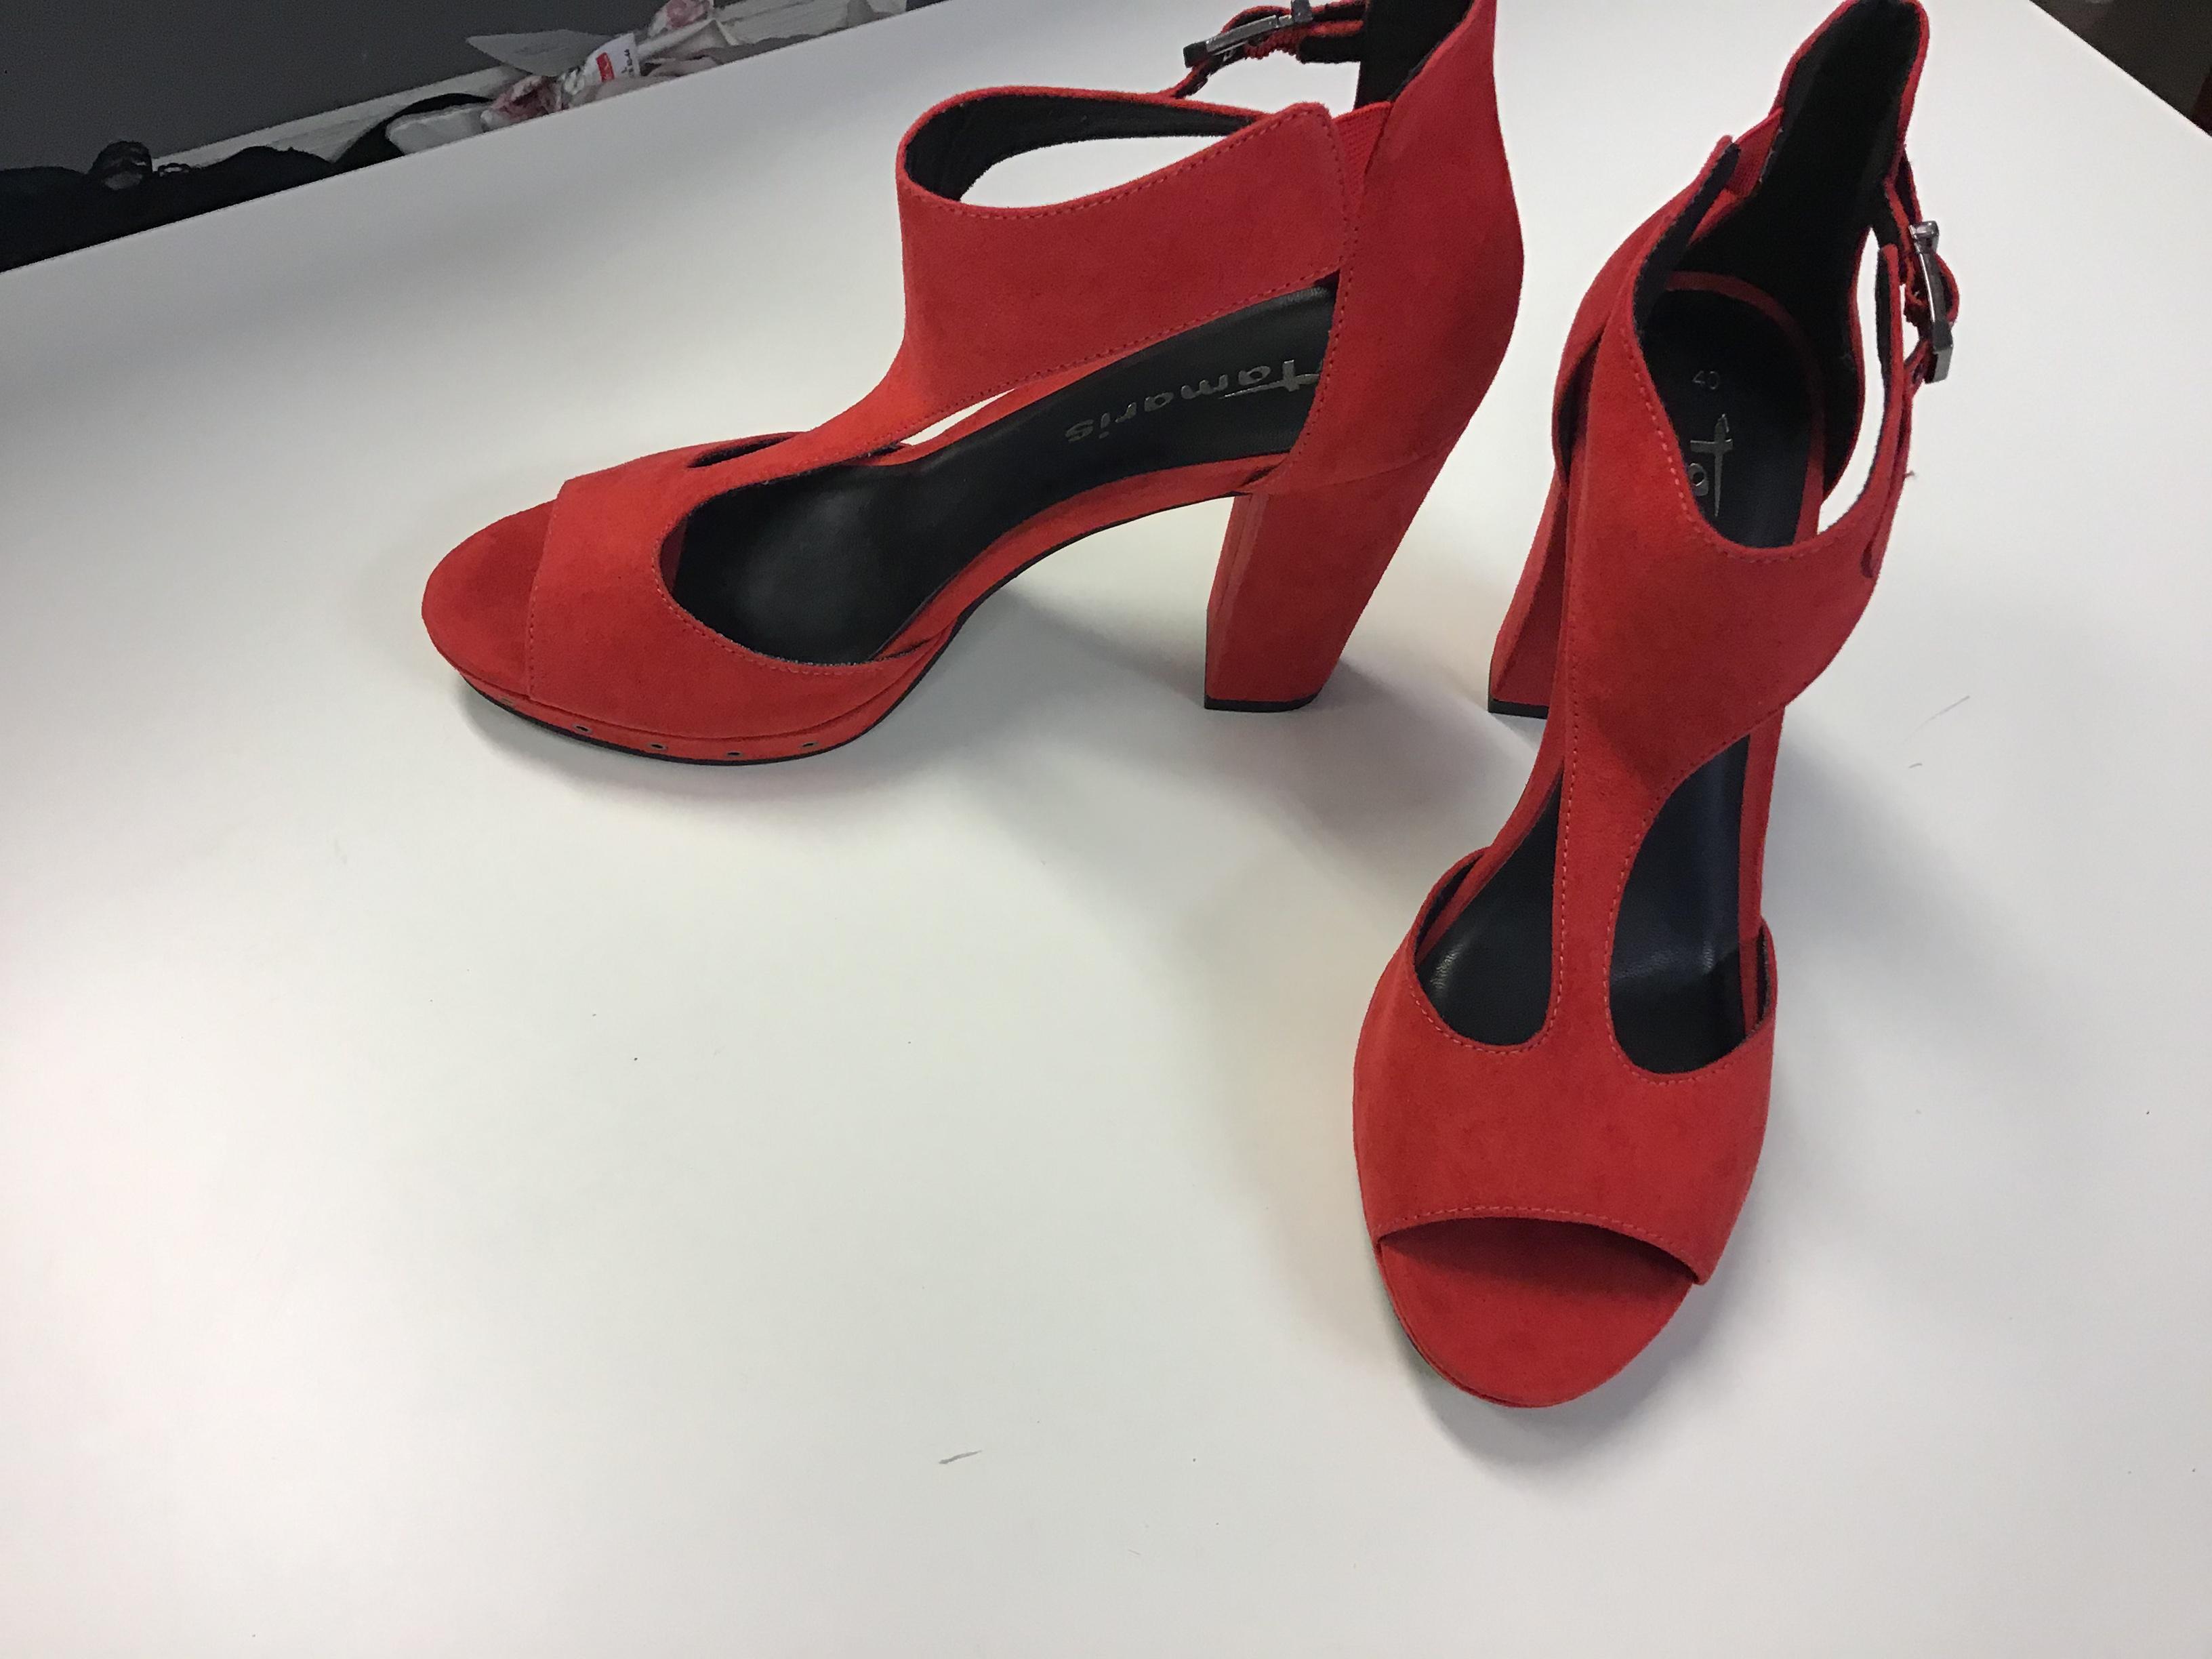 Kengät, Tamaris, koko 40